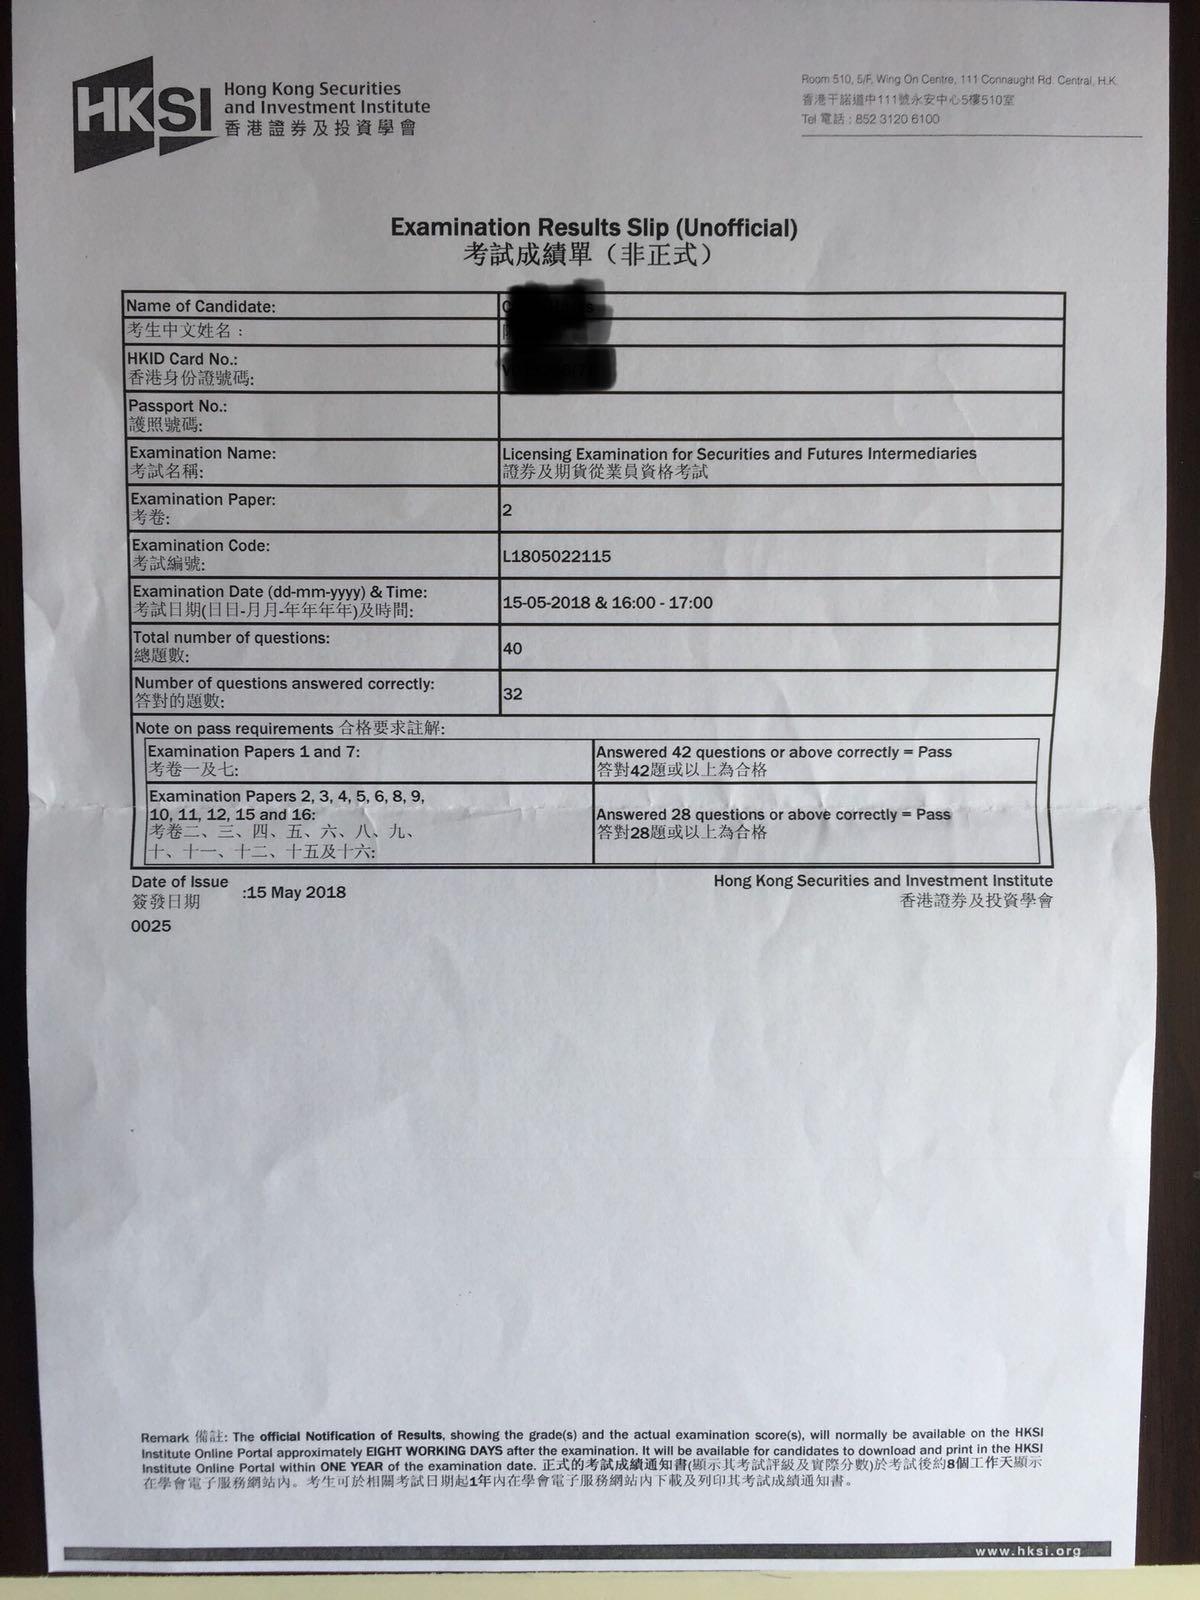 HC 15/5/2018 LE Paper 2 證券期貨從業員資格考試卷二 Pass